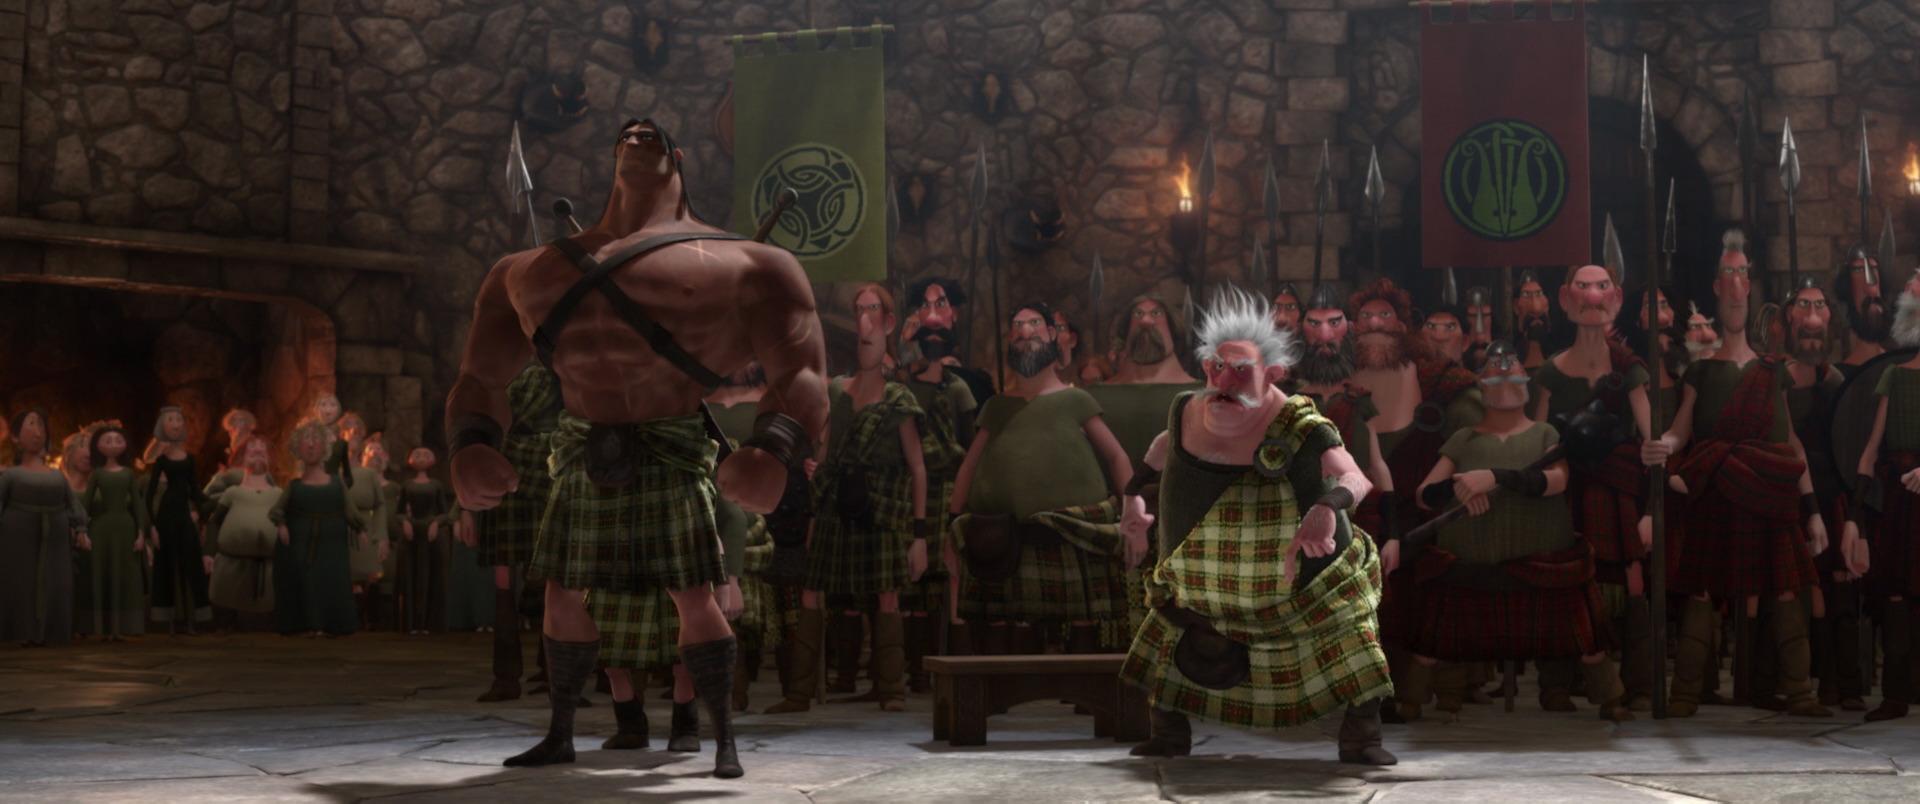 conan pixar disney character rebelle brave